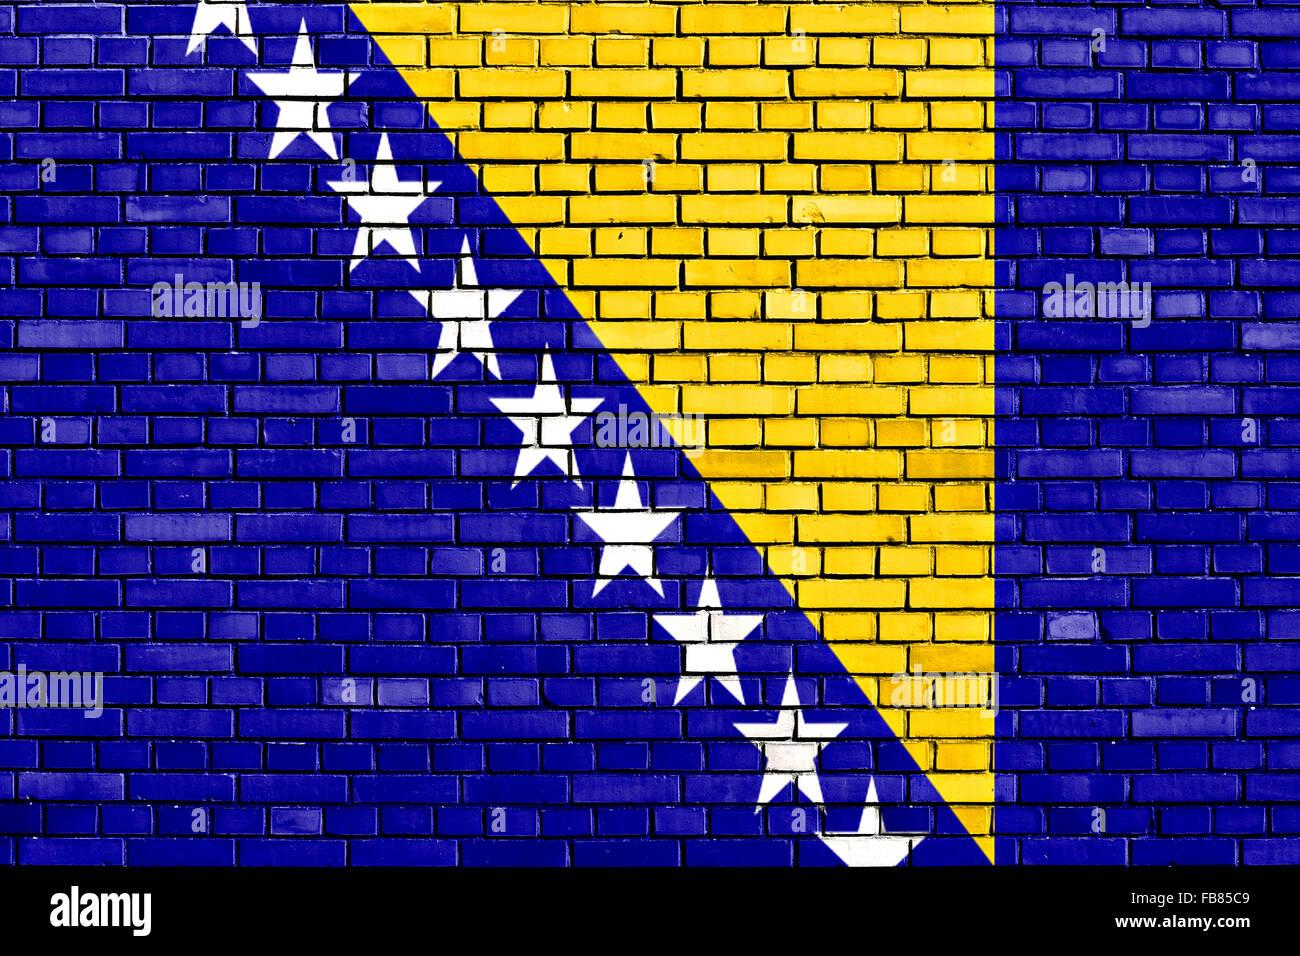 flag of Bosnia and Herzegovina painted on brick wall - Stock Image